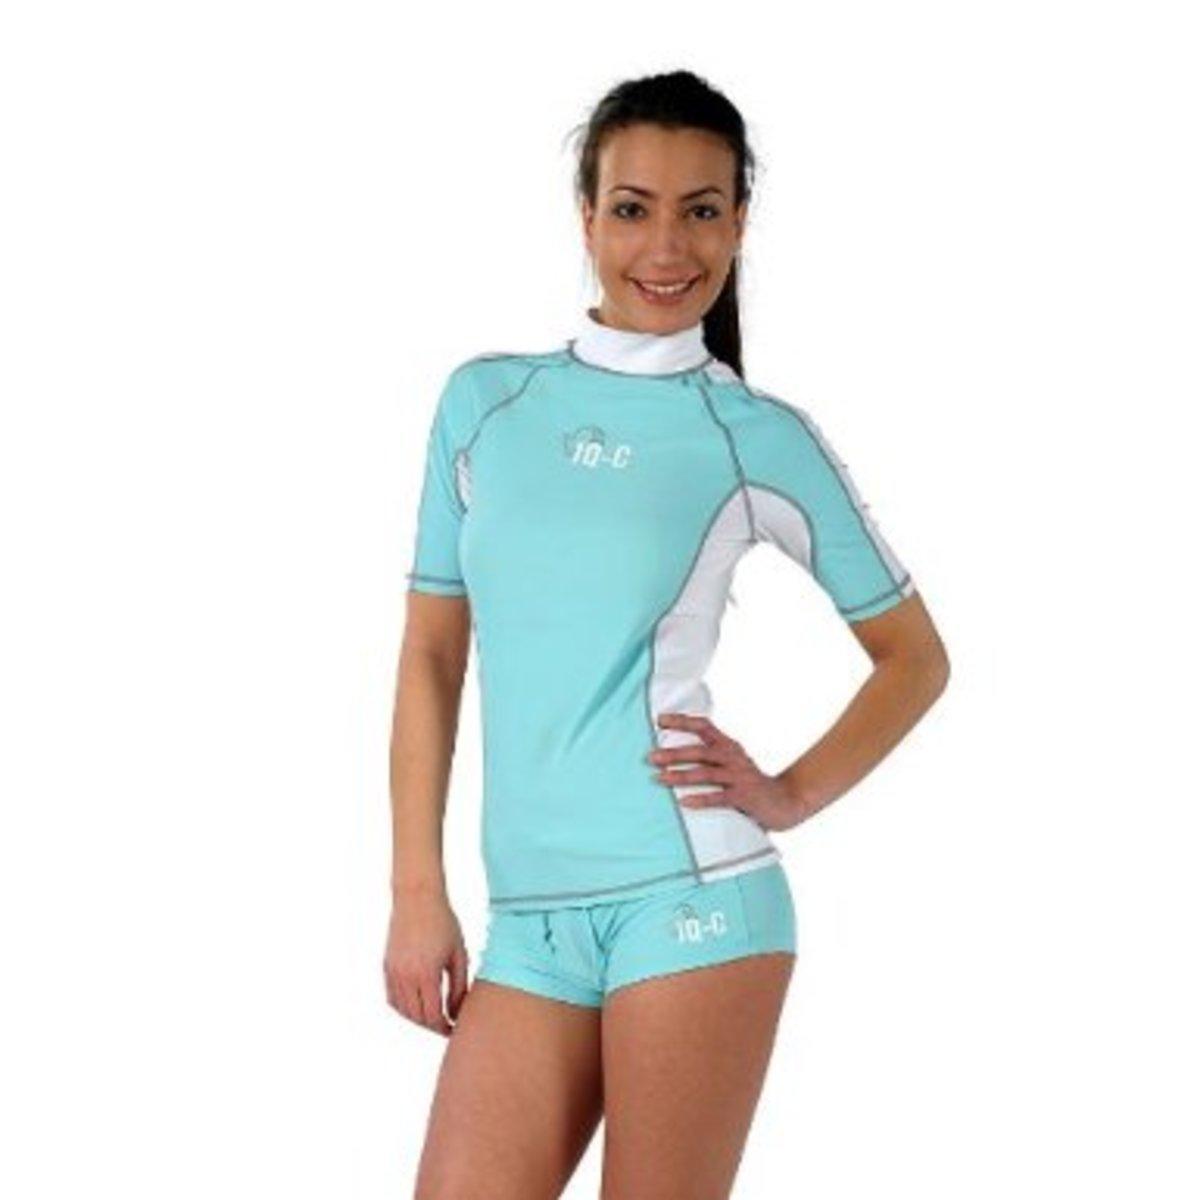 Matching Blue and White Swim Shorts and Rash Guard Shirt - Classic Swim Short